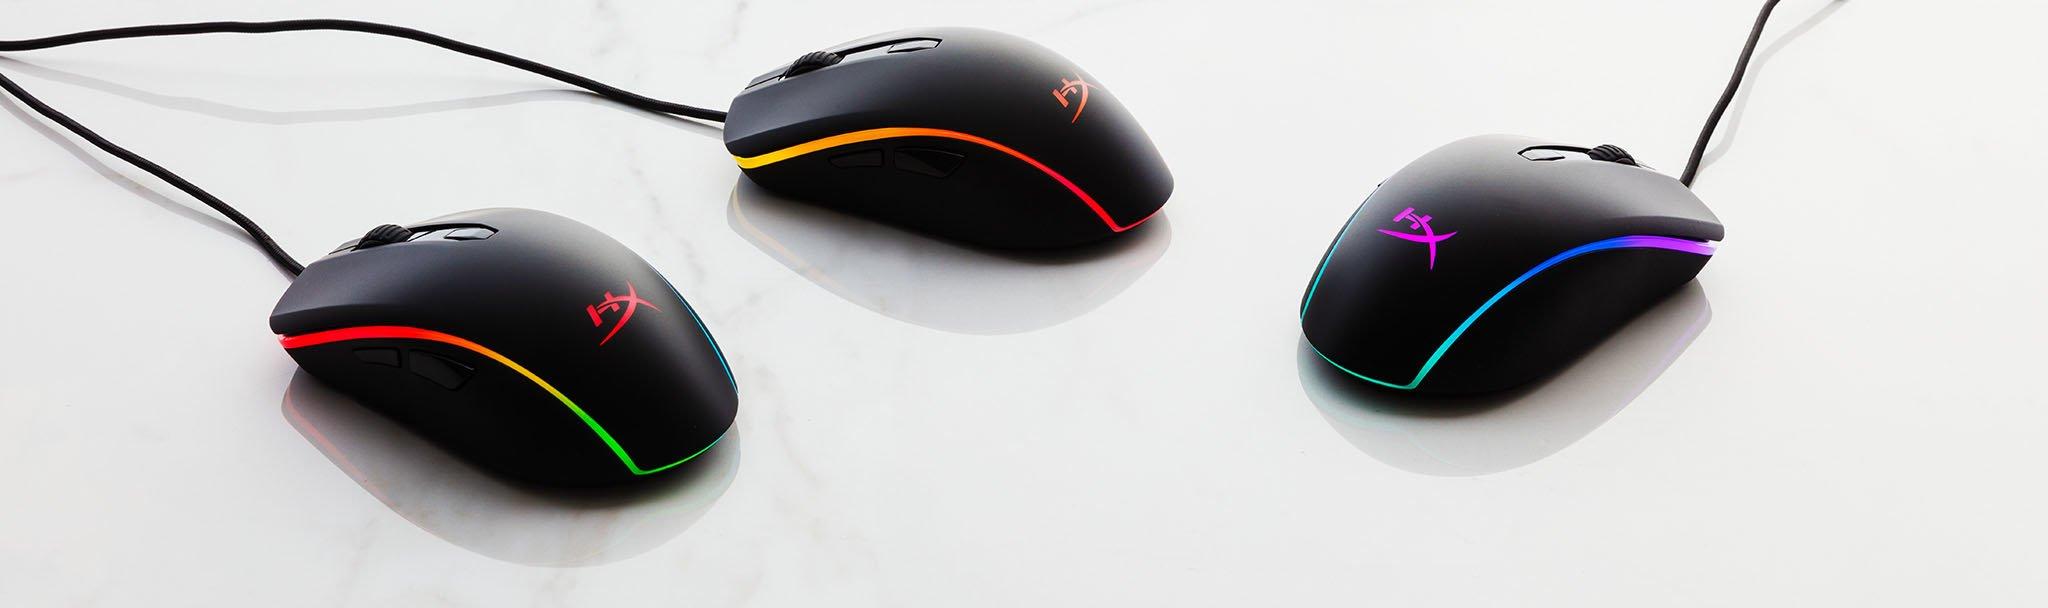 hx-keyfeatures-mouse-pulsefire-surge-5-lg